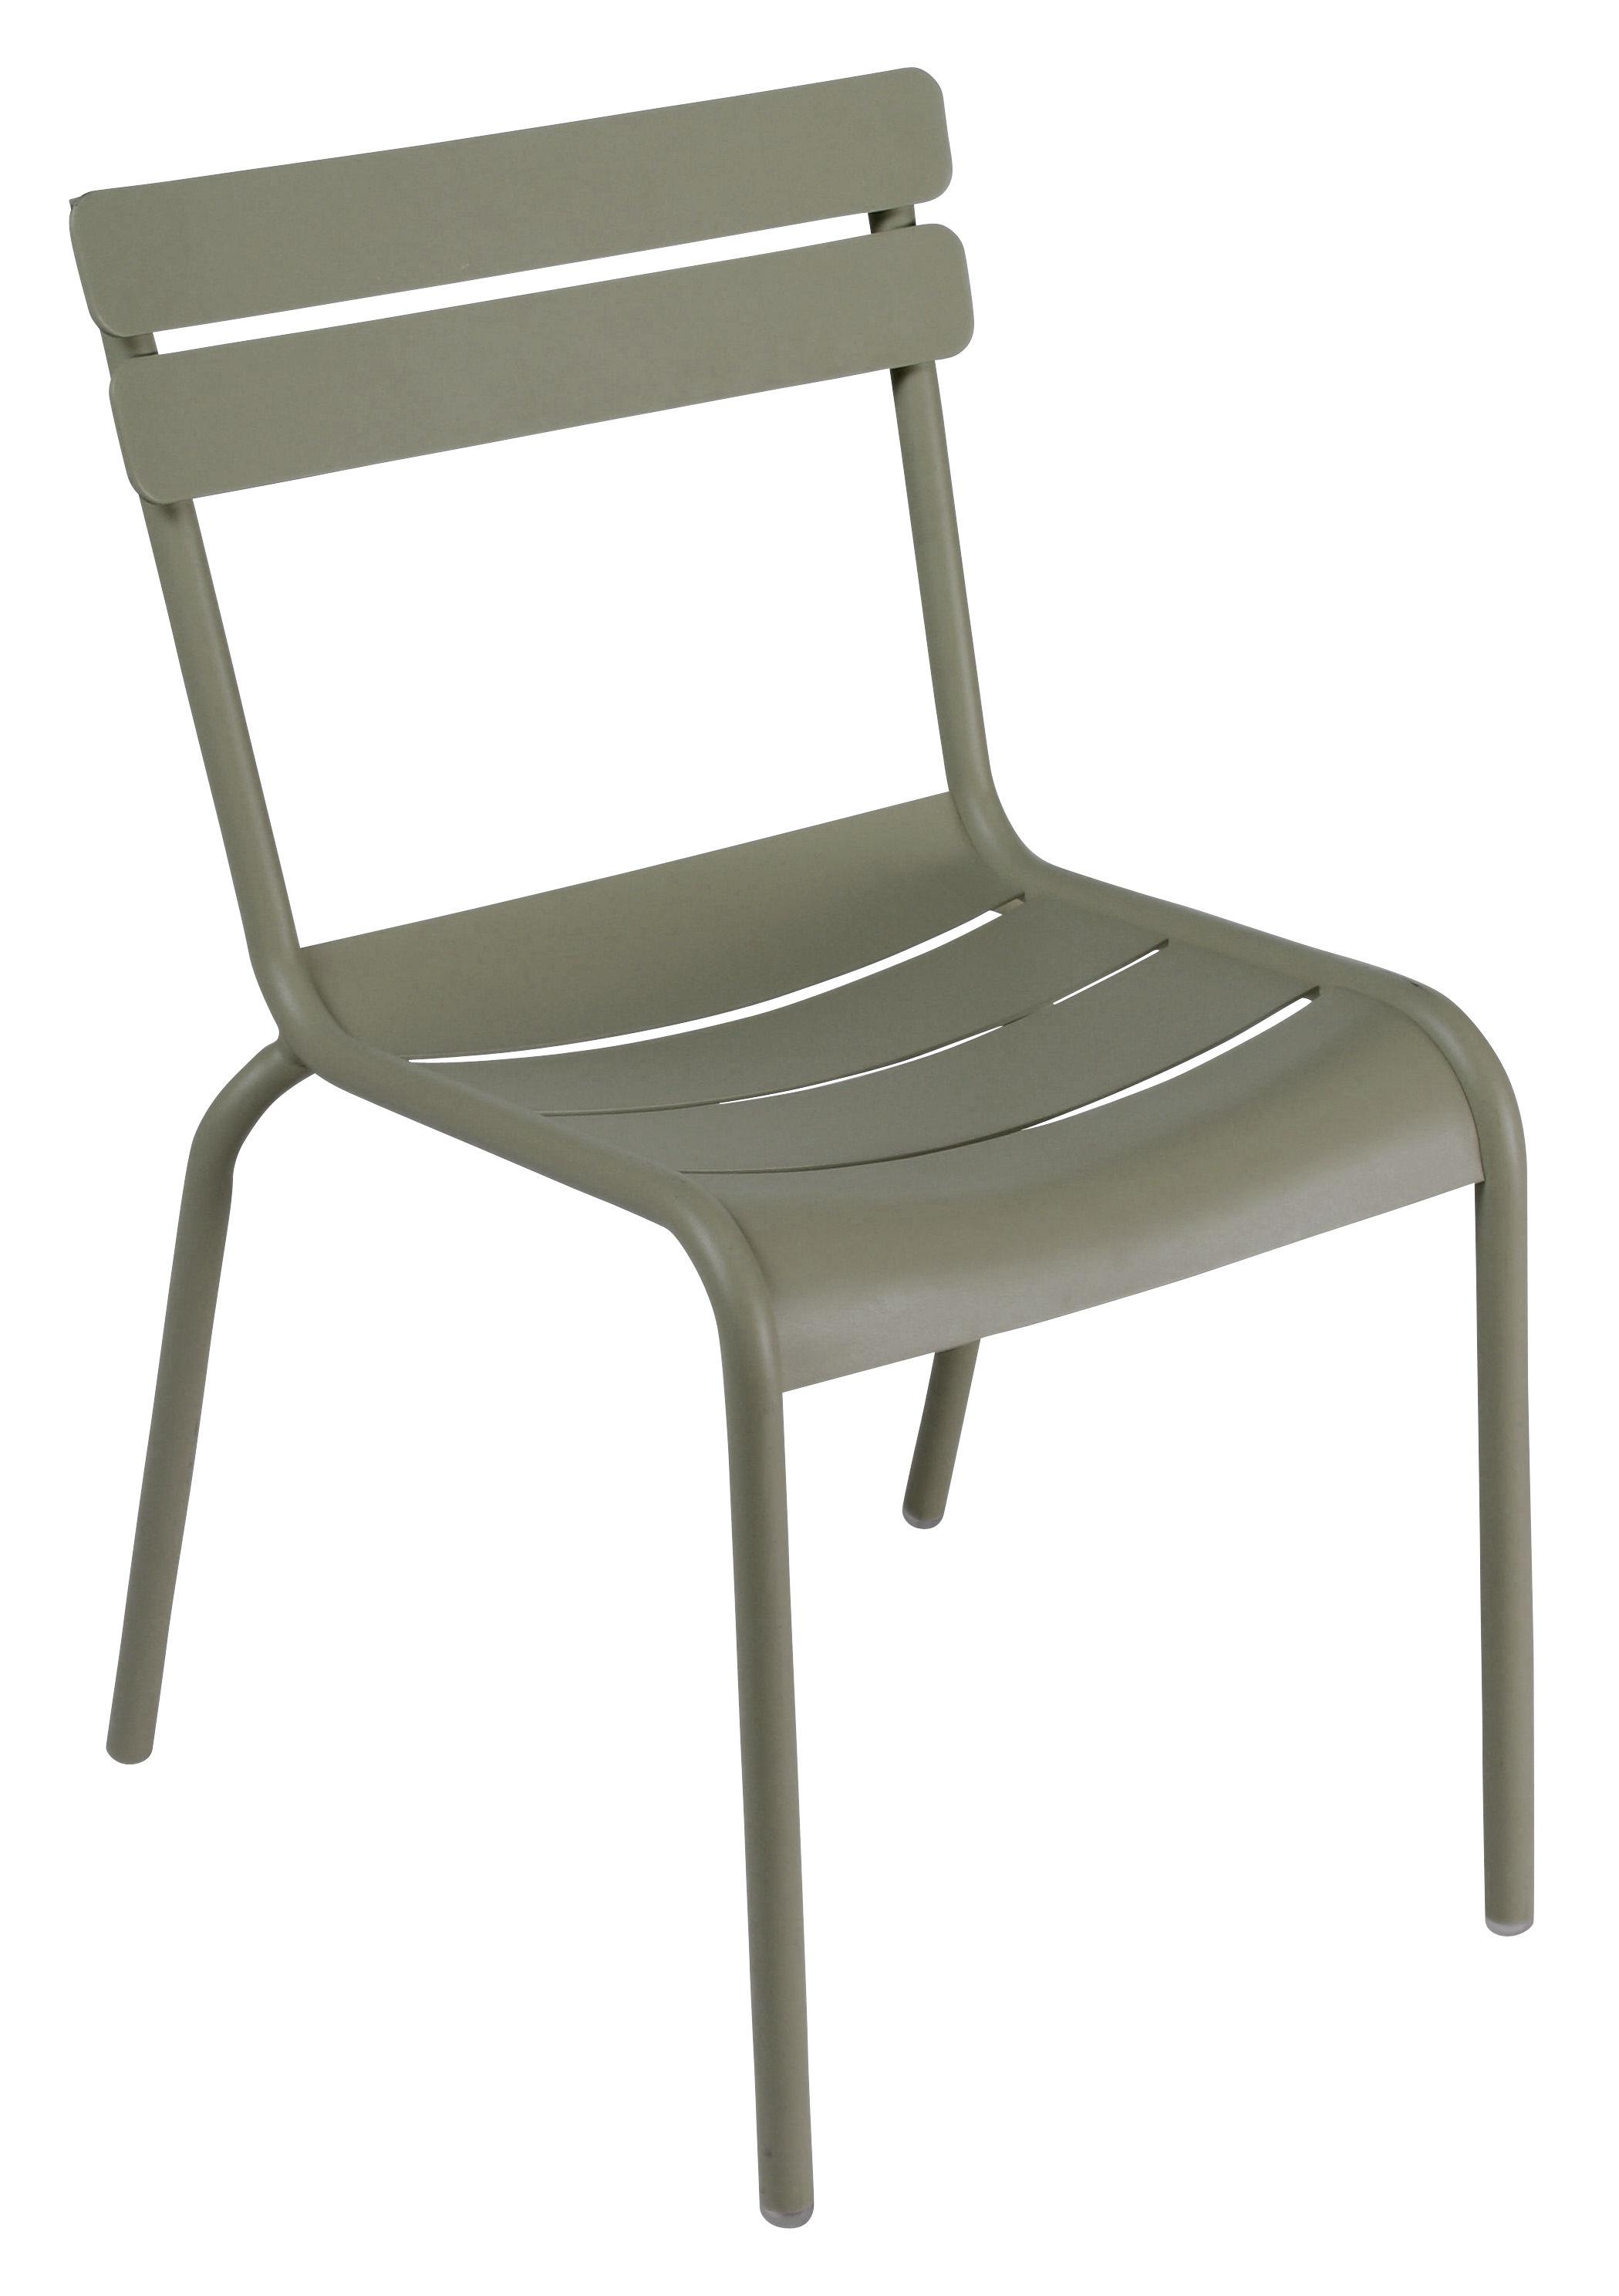 chaise empilable luxembourg aluminium savane fermob. Black Bedroom Furniture Sets. Home Design Ideas